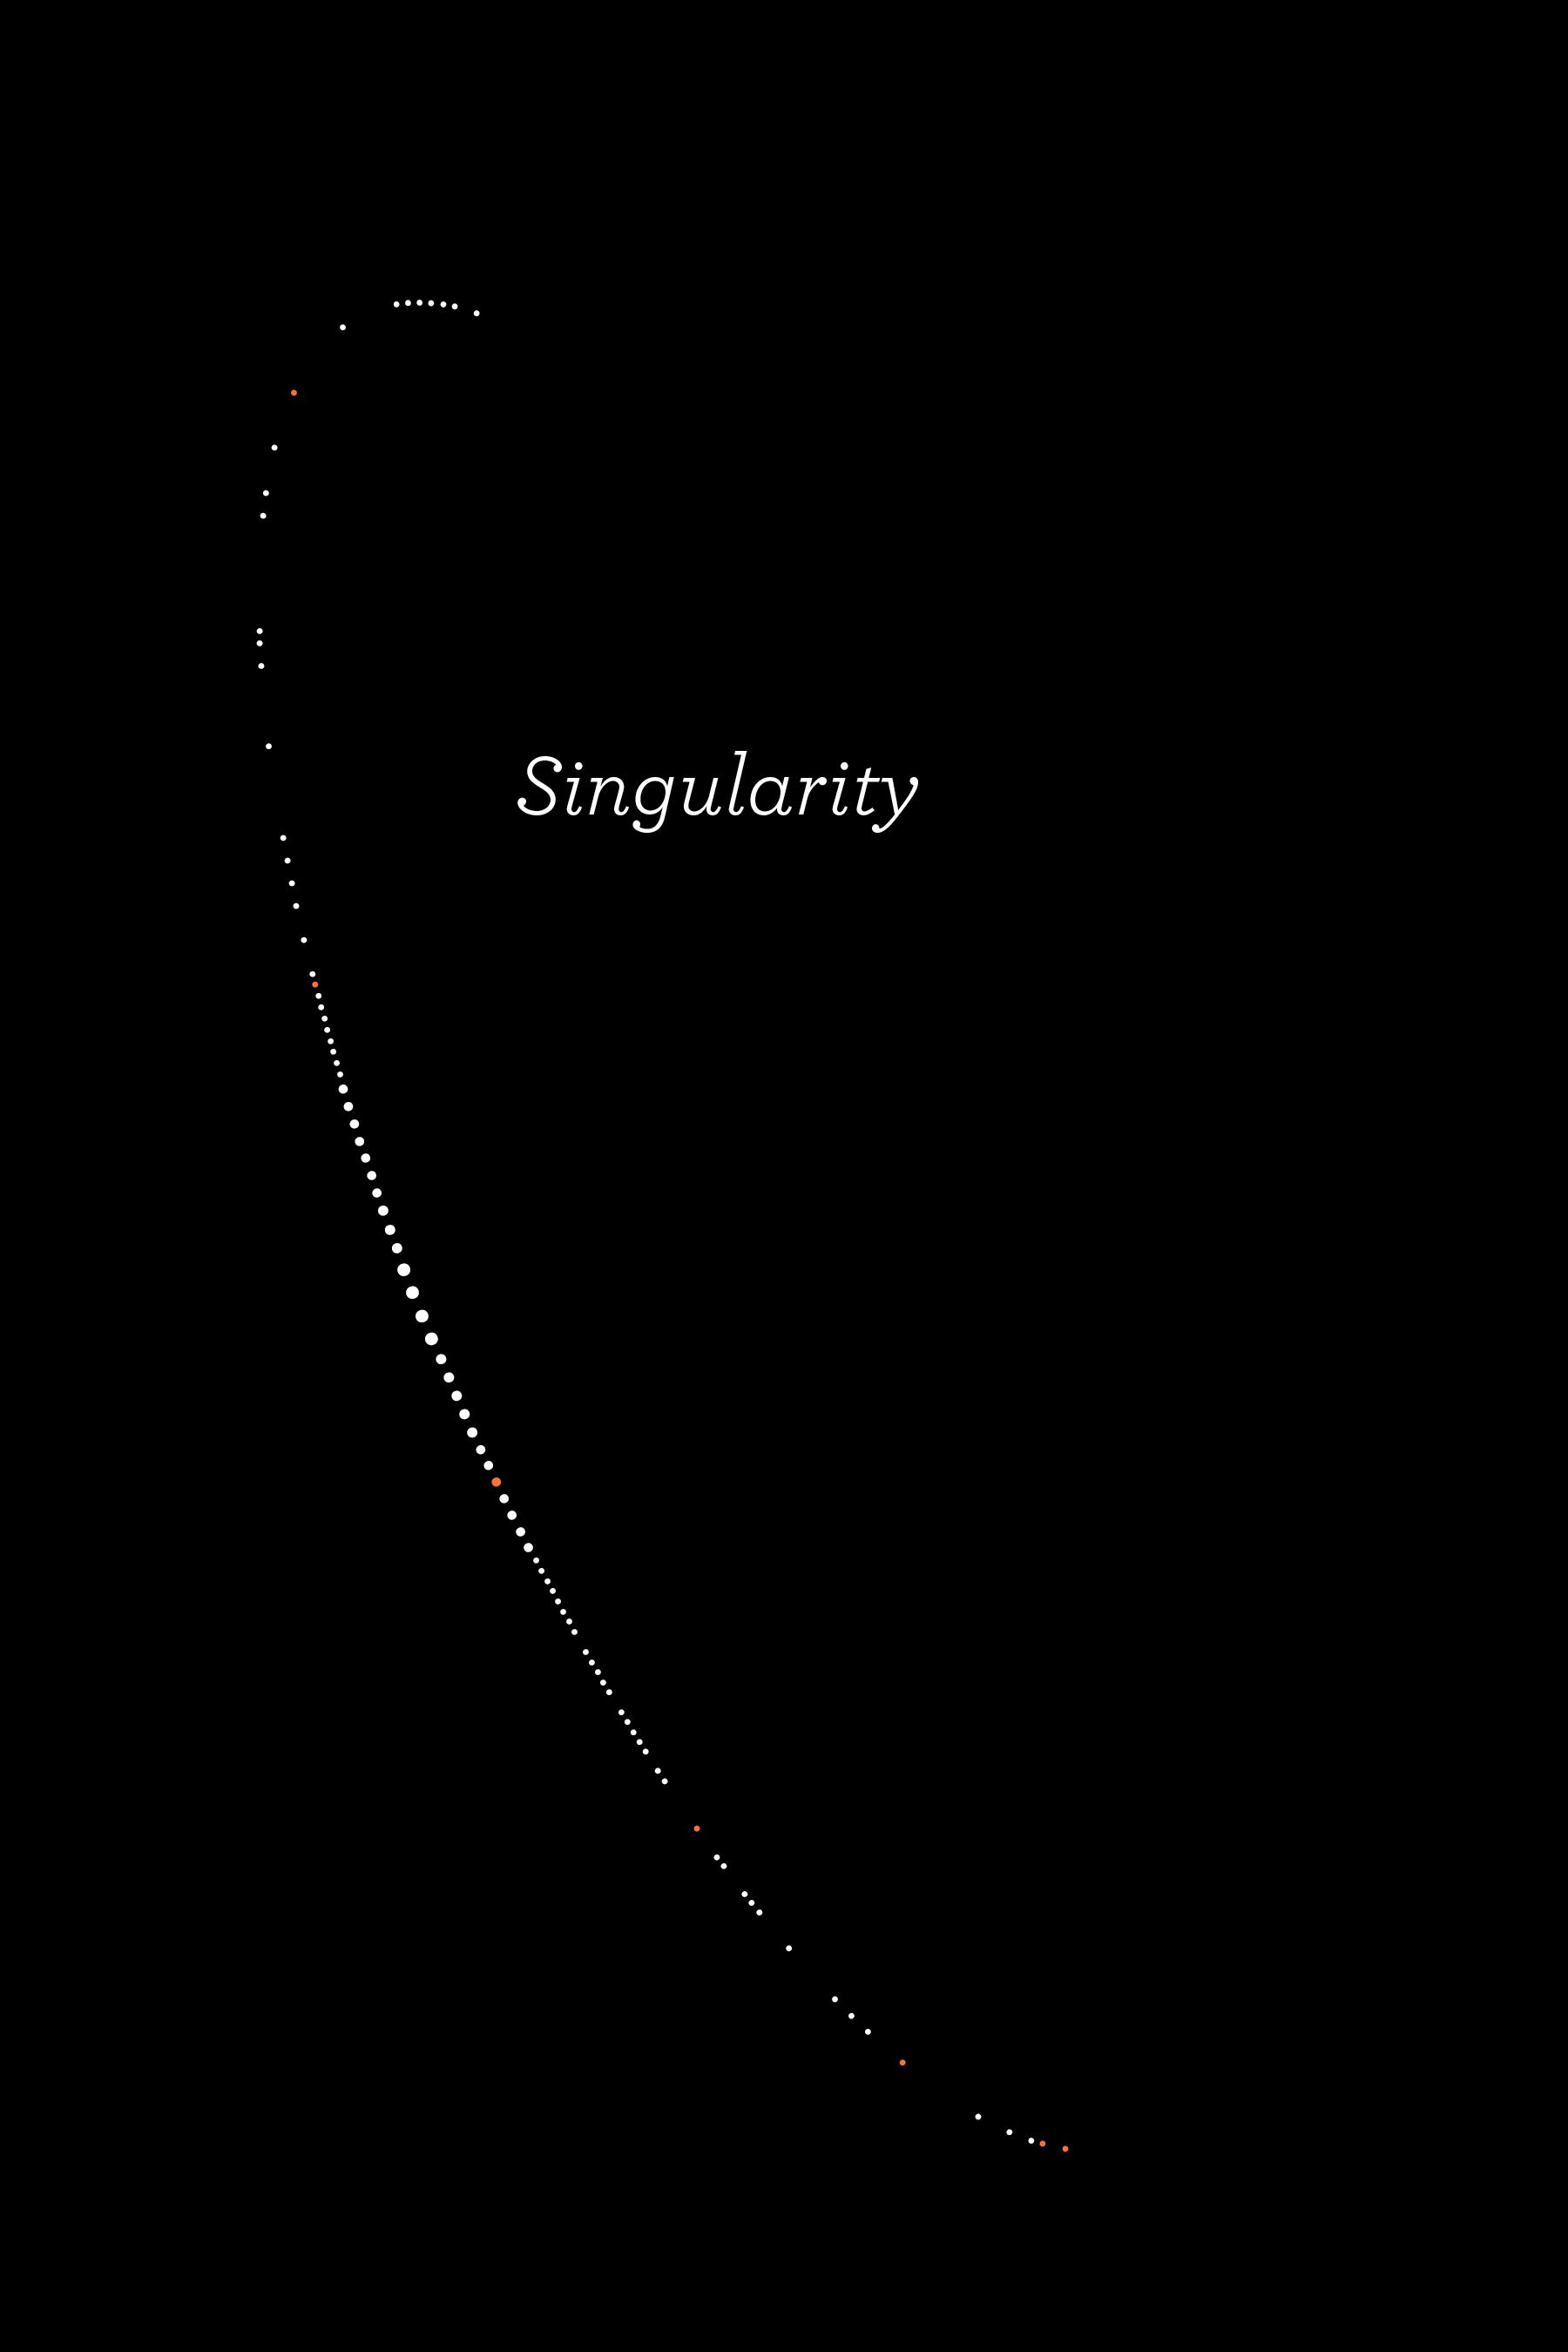 Singularity_Web.png